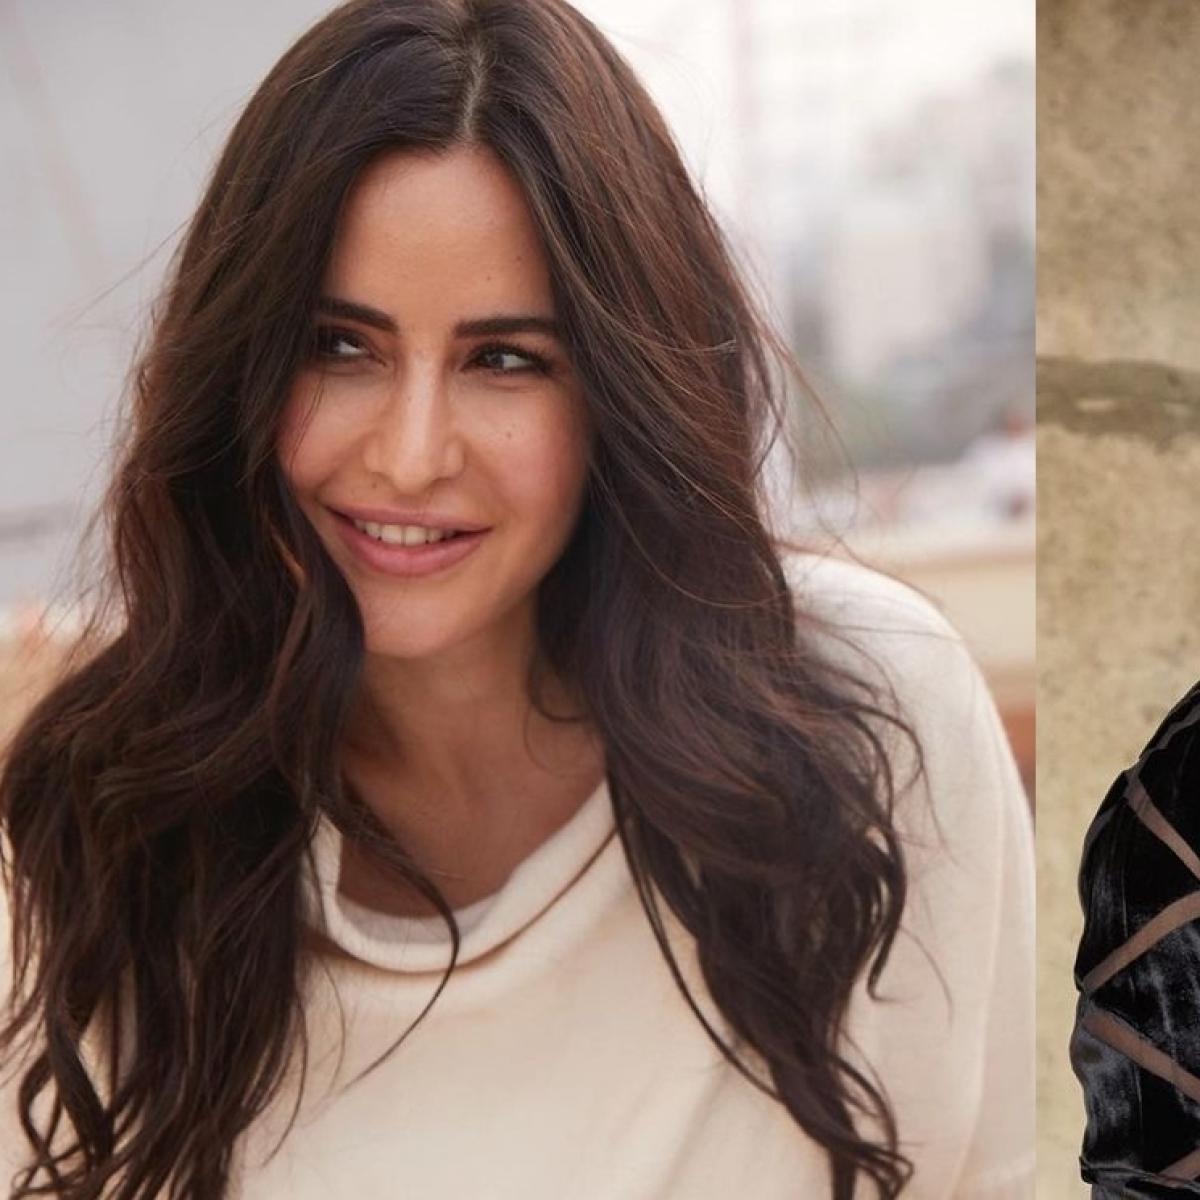 Vicky Kaushal Birthday Special: Tracing romance rumours with Katrina Kaif